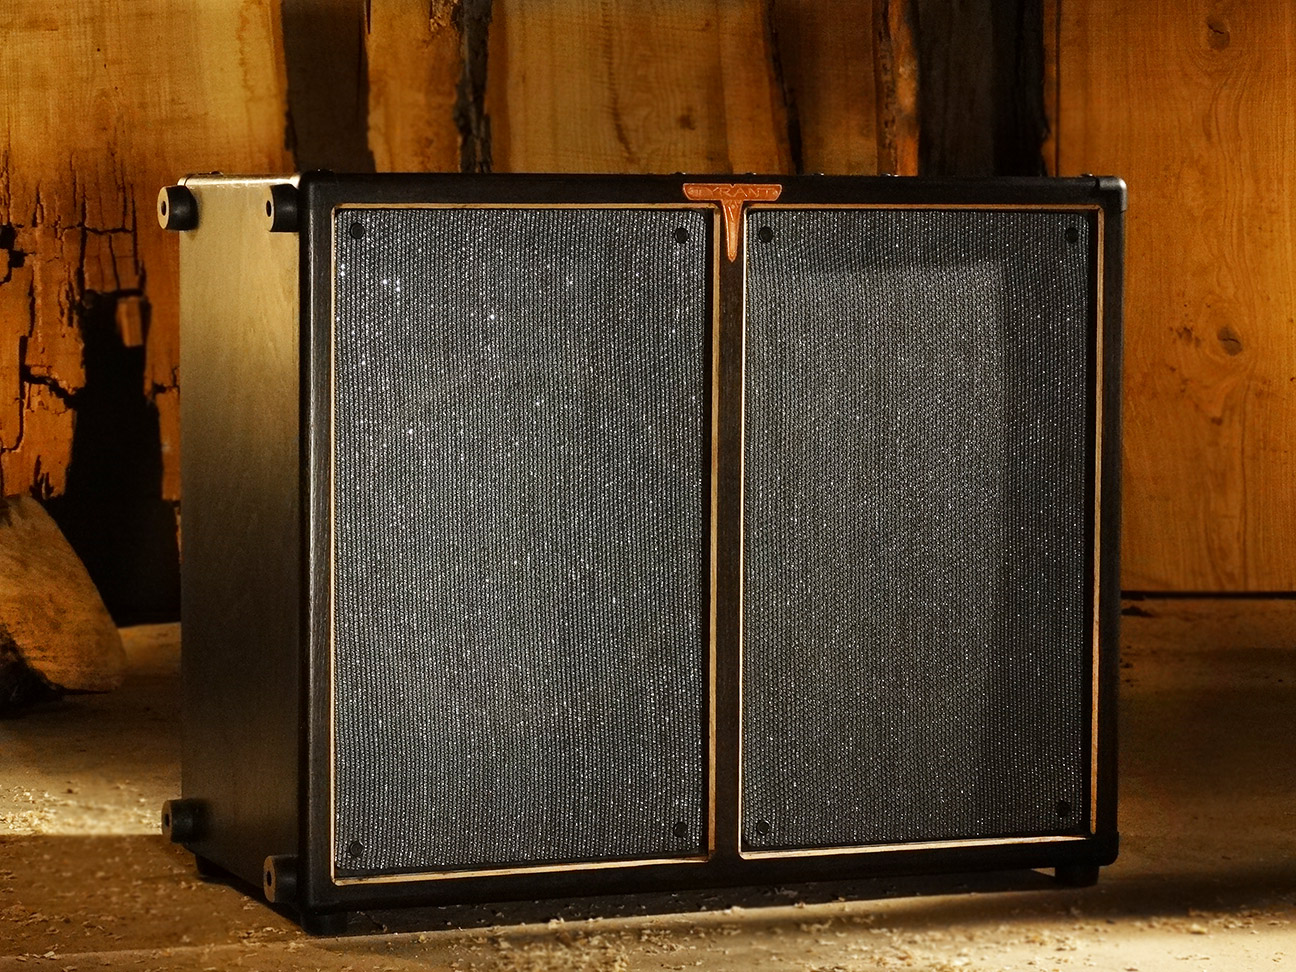 Guitar 212 Cab (horizontal)